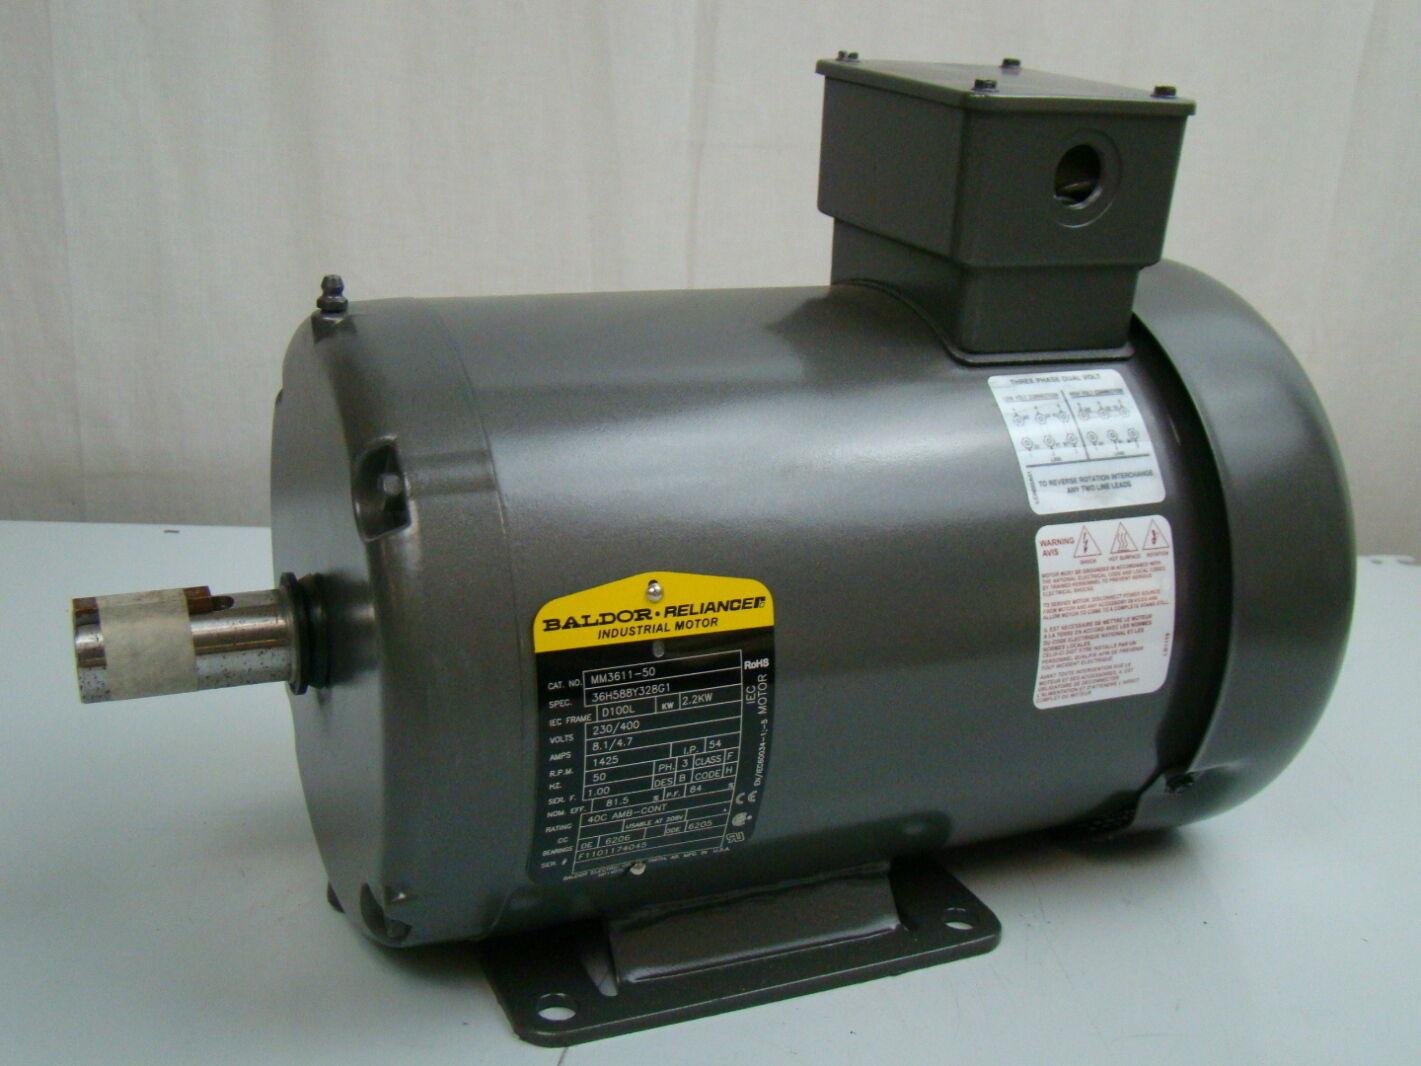 Baldor 2 2 Kw 1425 Rpm Electric Motor Mm3611 50 Joseph